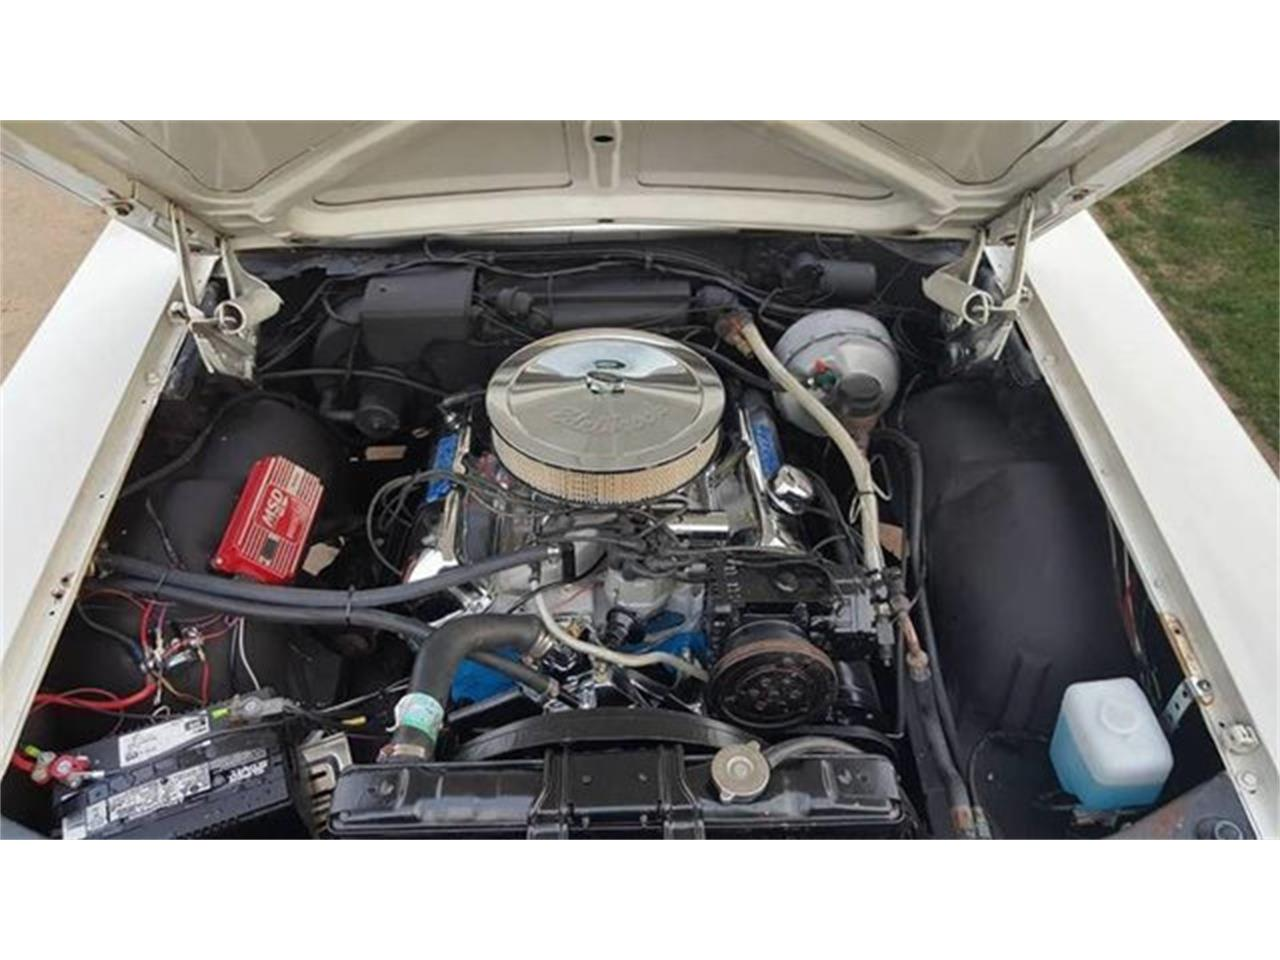 [ZHKZ_3066]  1966 Ford Galaxie 500 for Sale | ClassicCars.com | CC-1255106 | 1966 Ford Galaxie Wiring Harness |  | Classic Cars